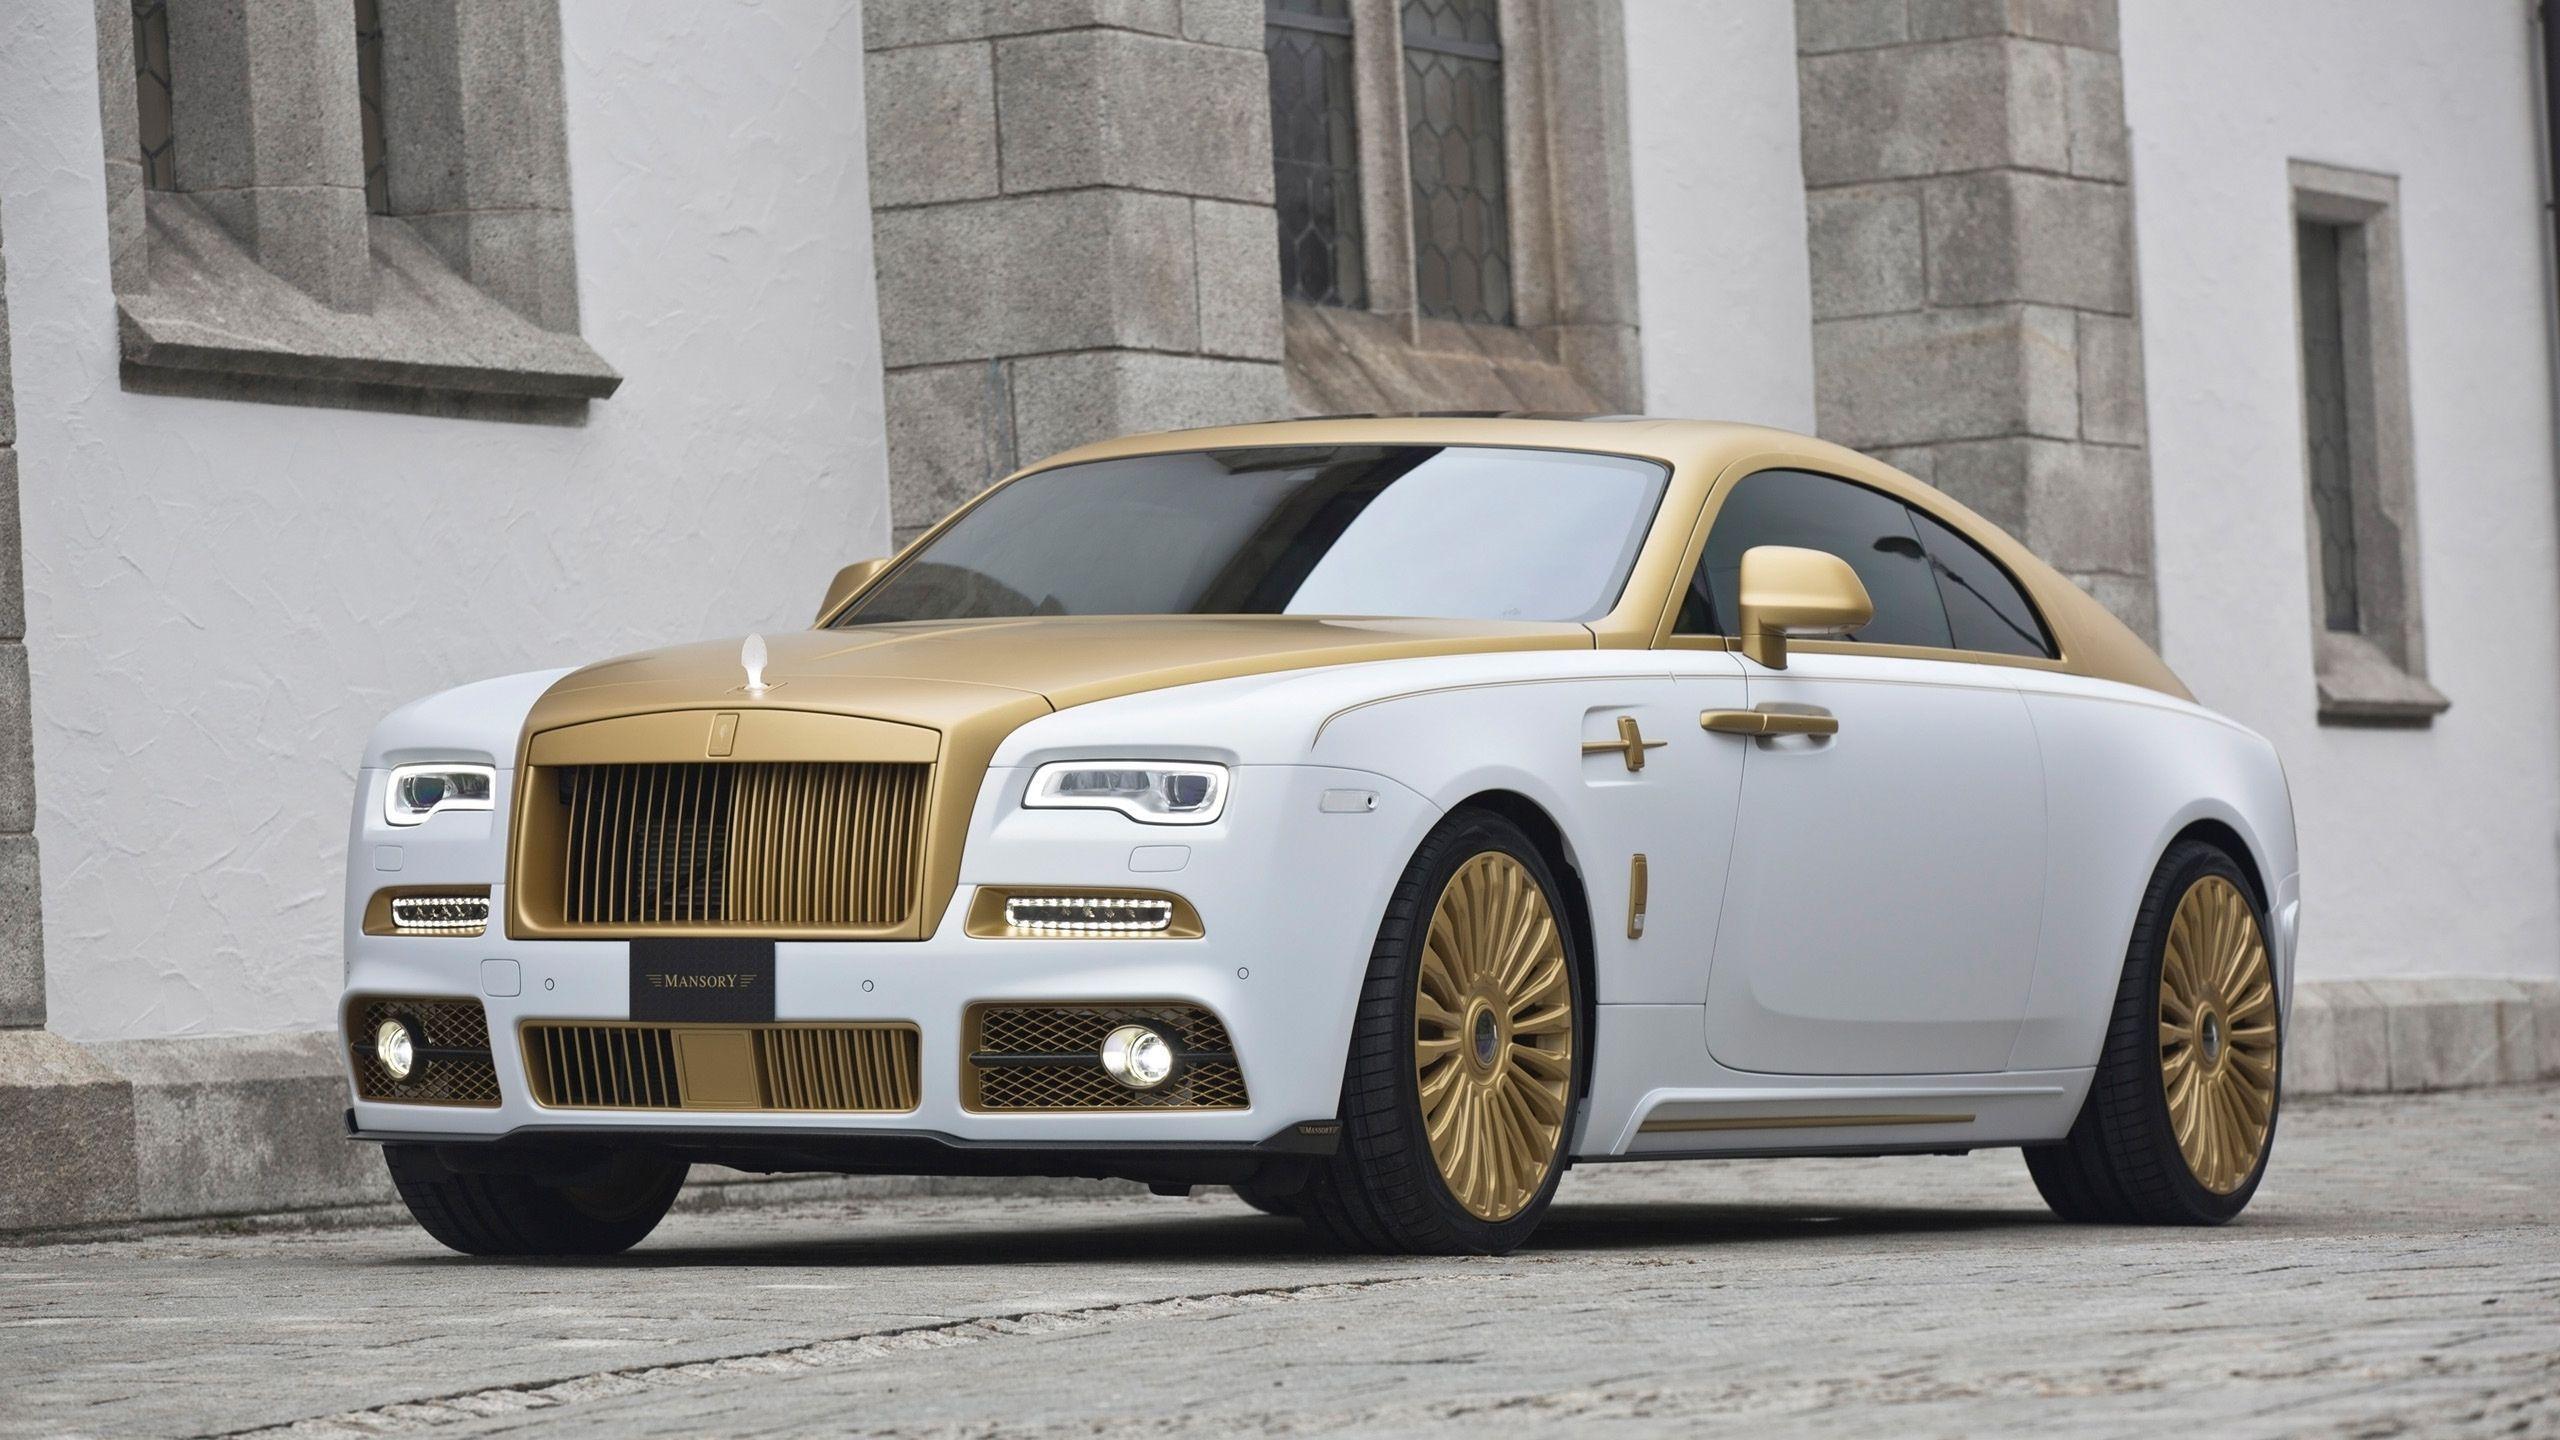 Gold Rolls Royce Wallpapers Wallpaper Cave